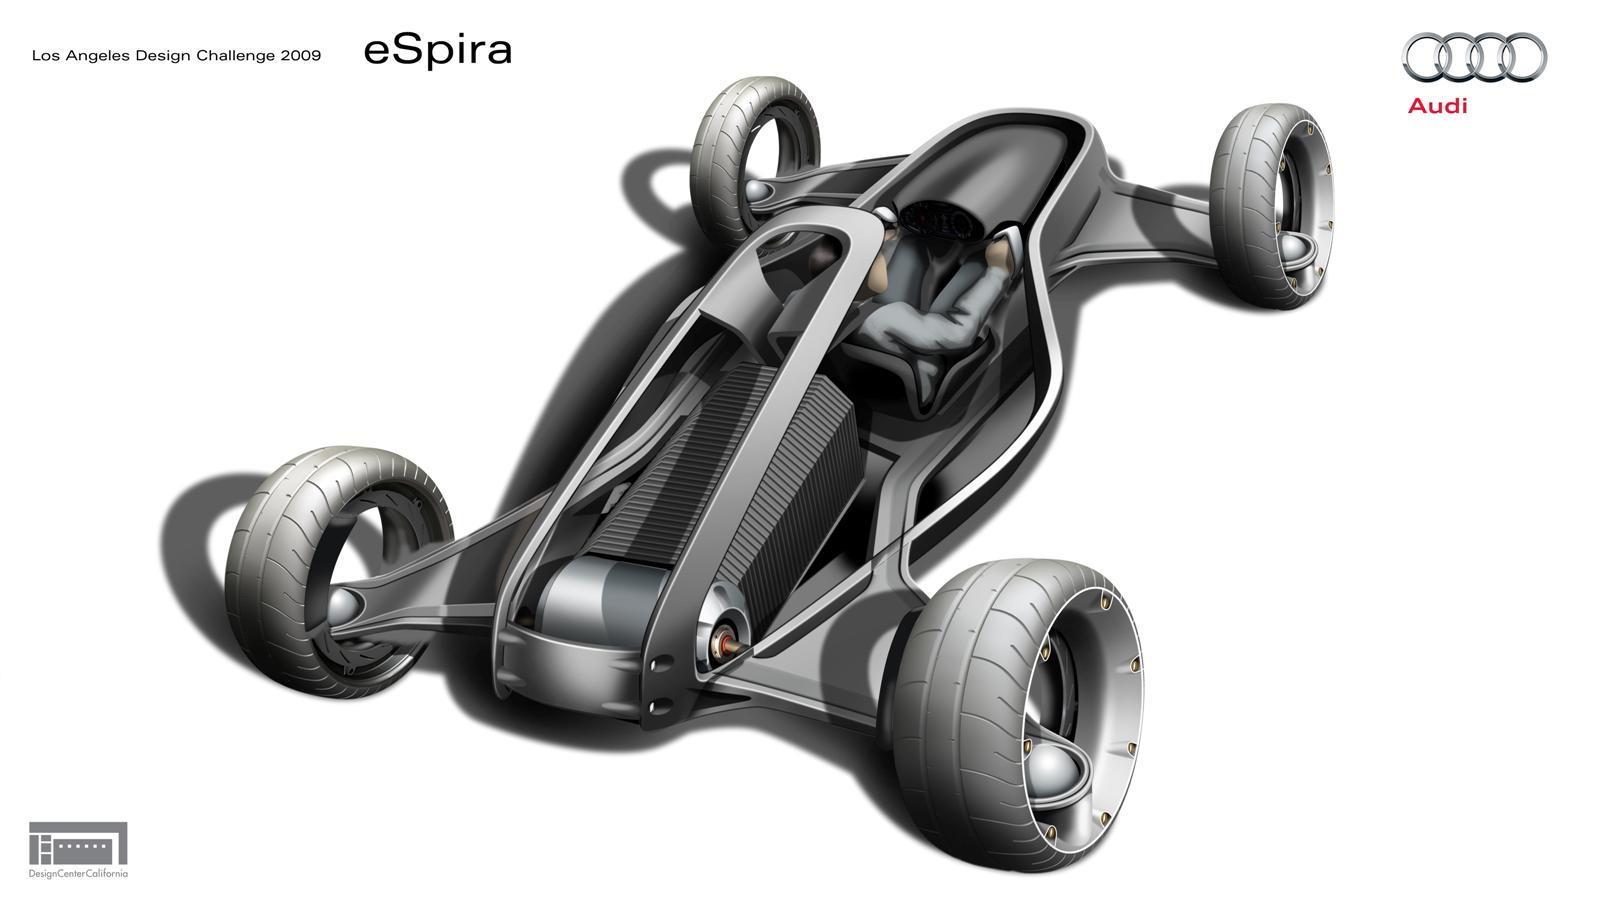 2009 Audi Design Challenge Entries eOra and eSpira